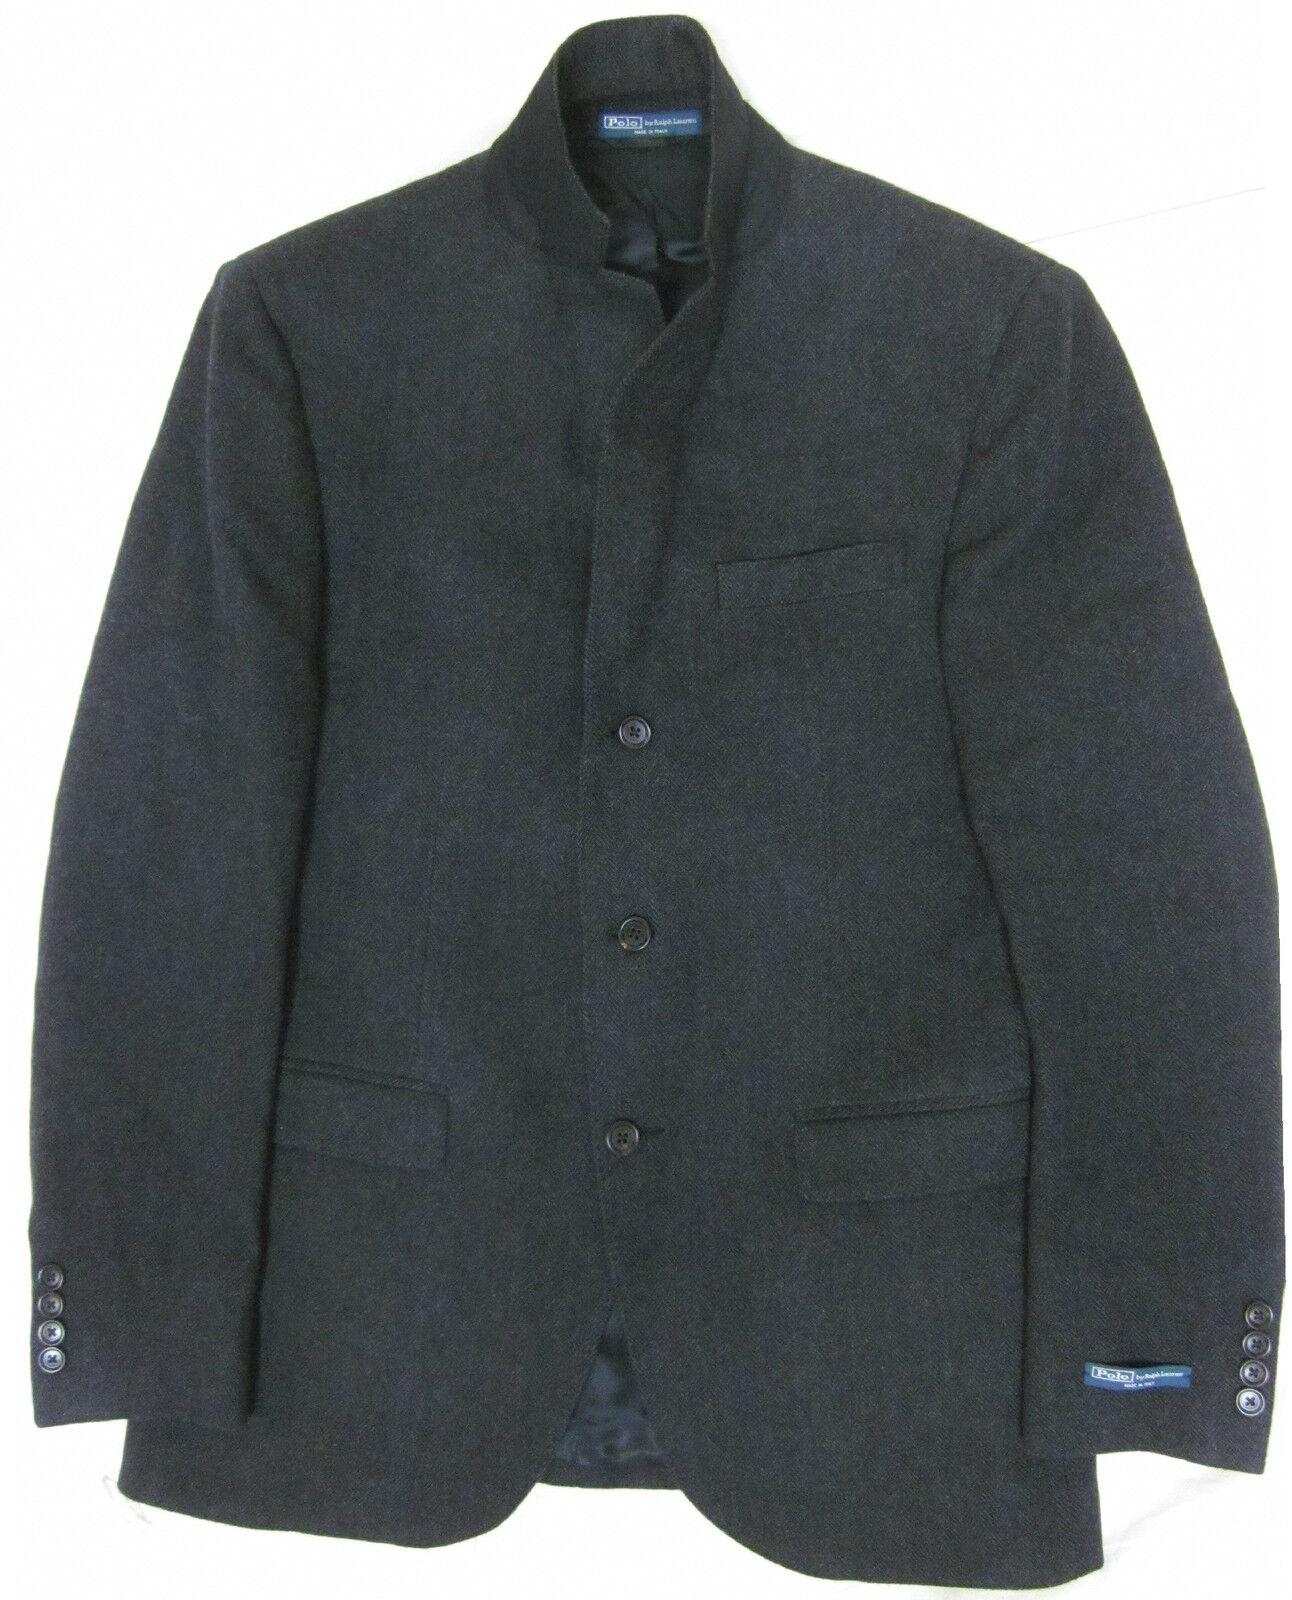 NWT  Polo Ralph Lauren  made Wool Blazer Sportcoat 40R 40 R